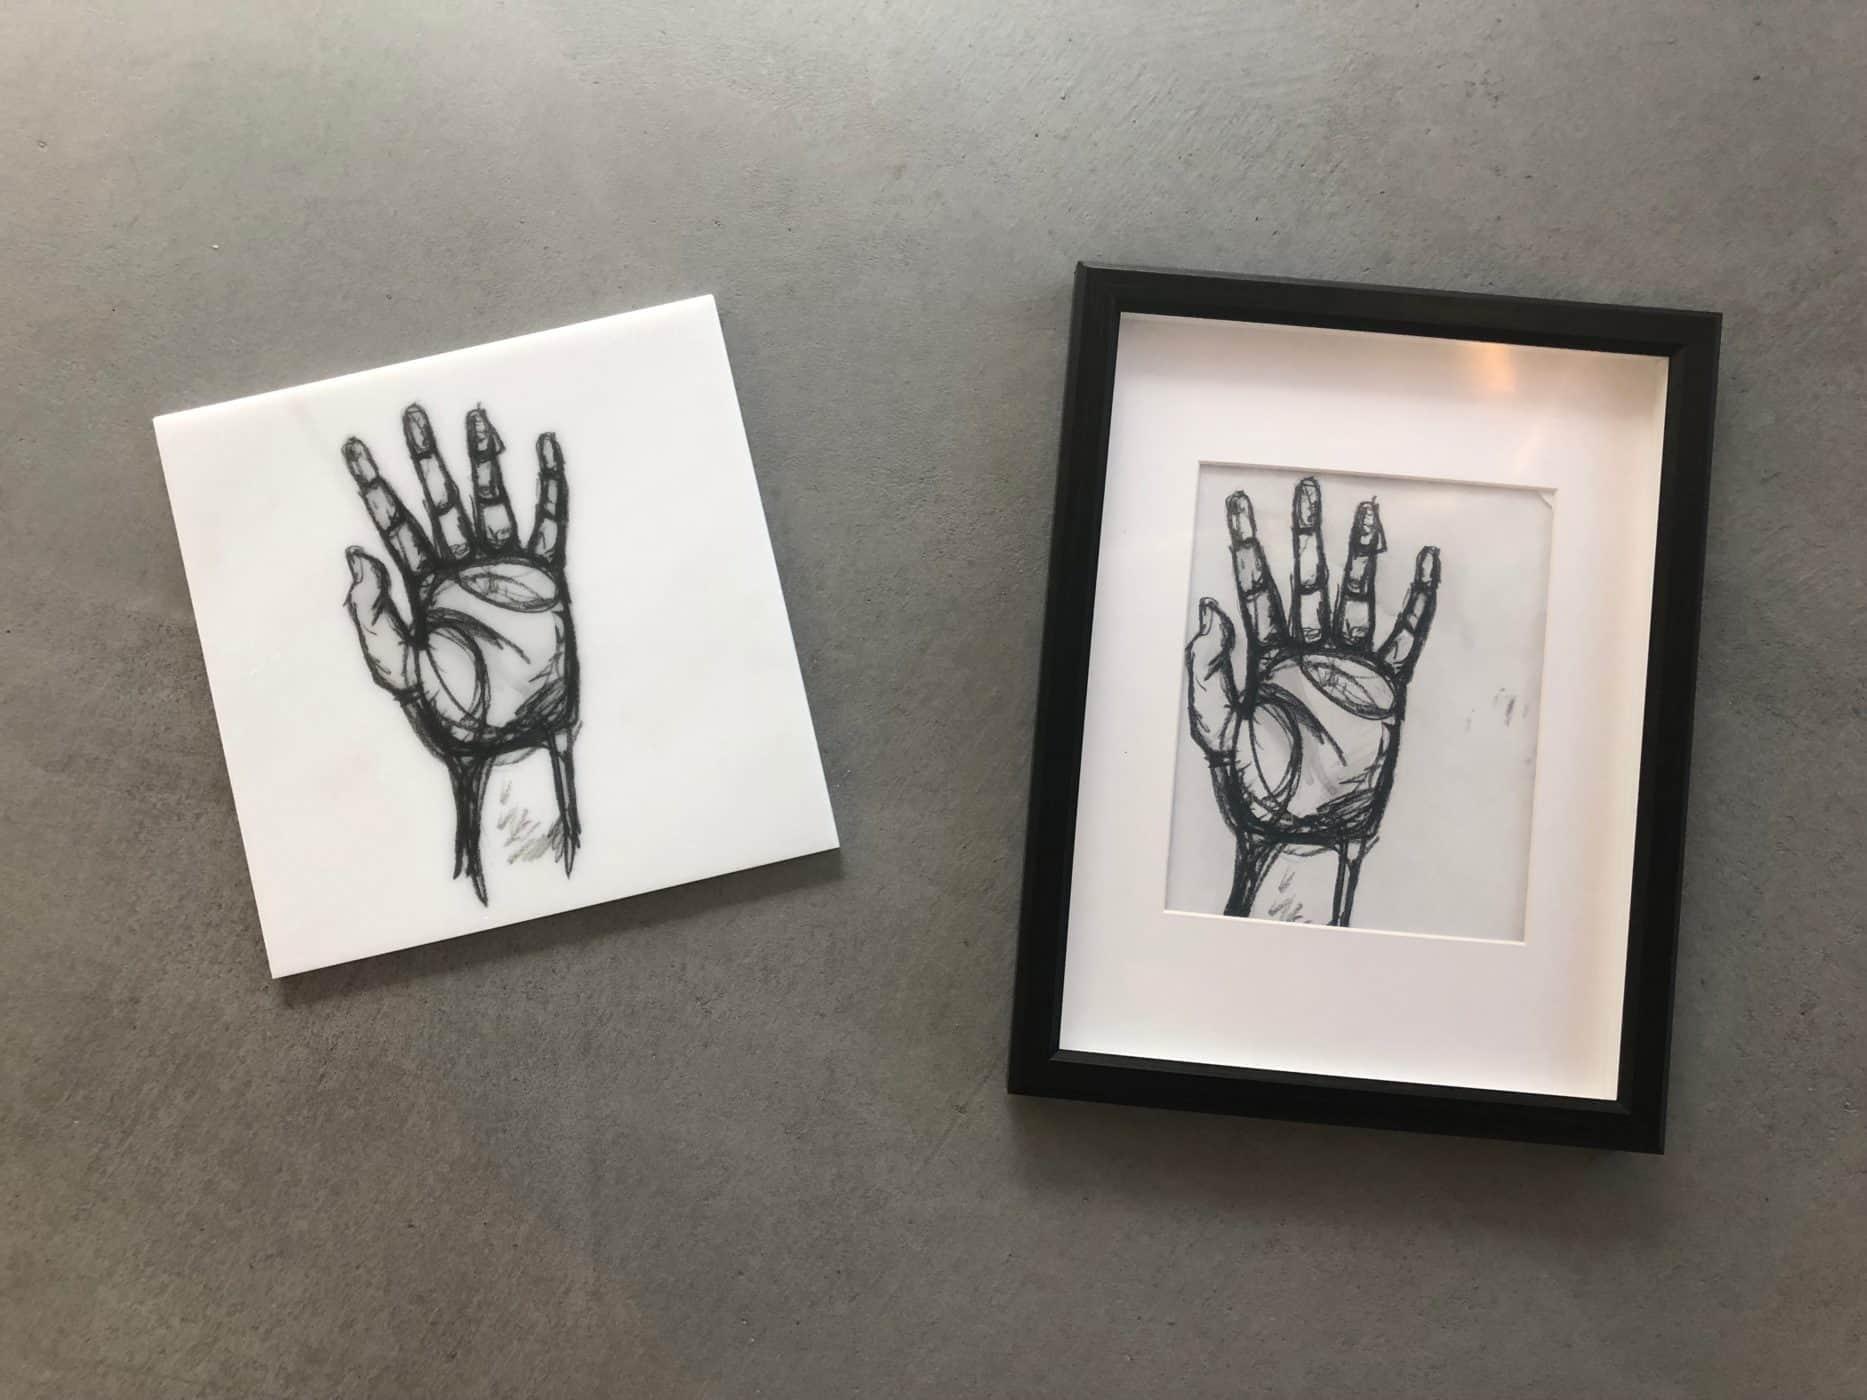 Comparison of original artwork and artwork printed on stone